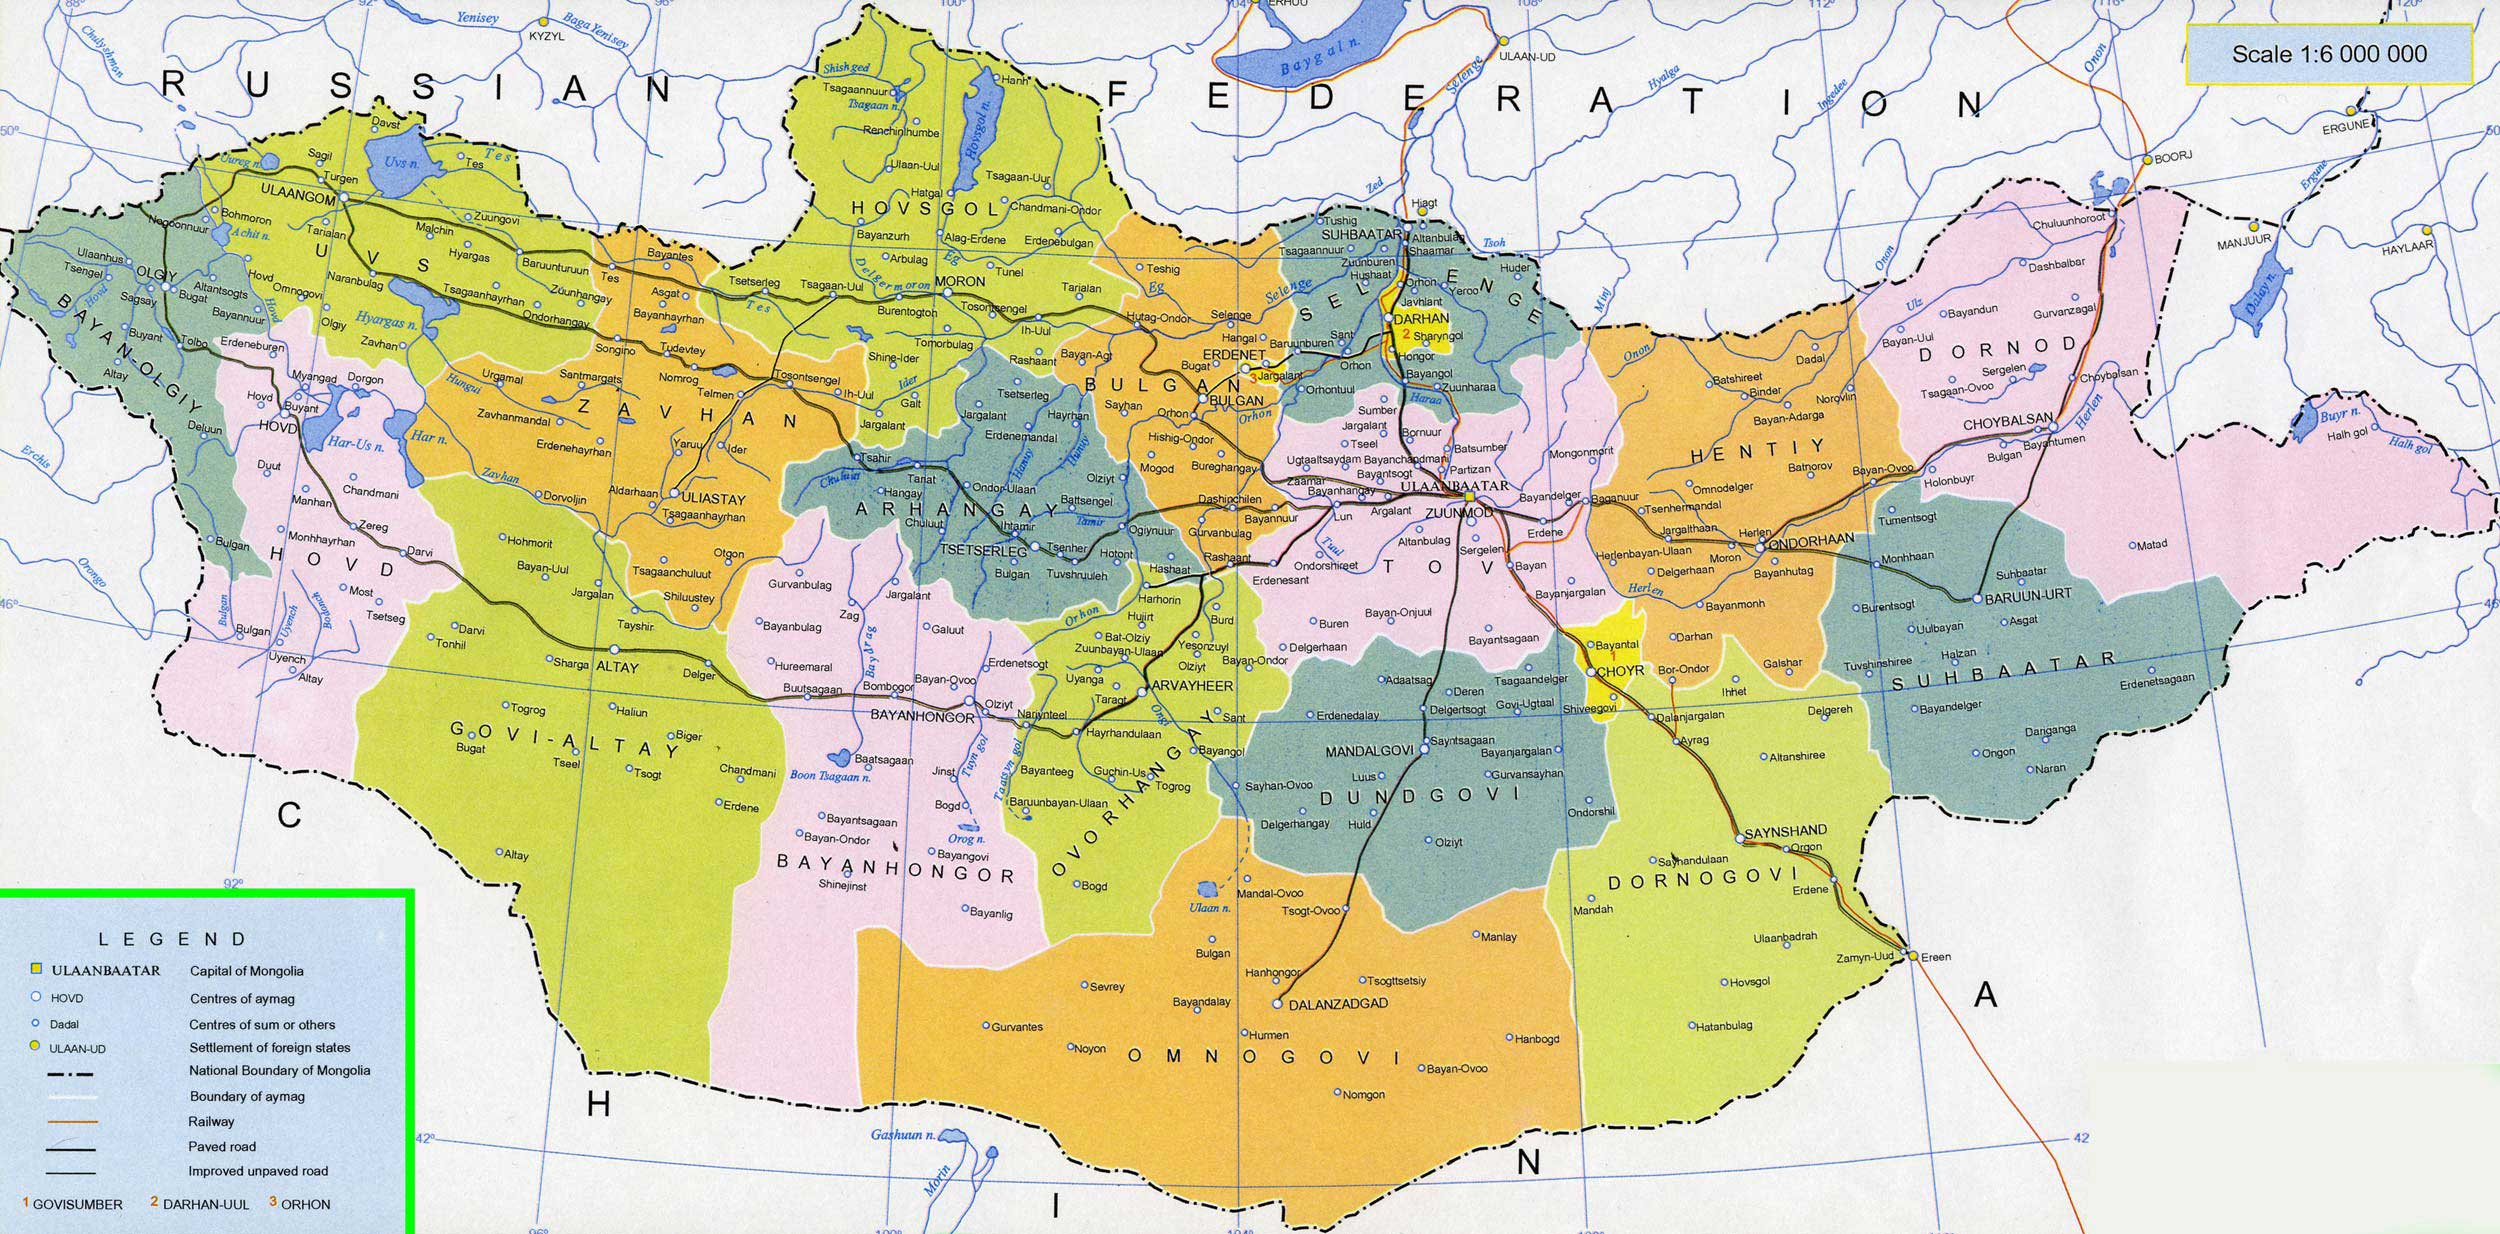 Curso Mongolia - Mapa Mongolia político